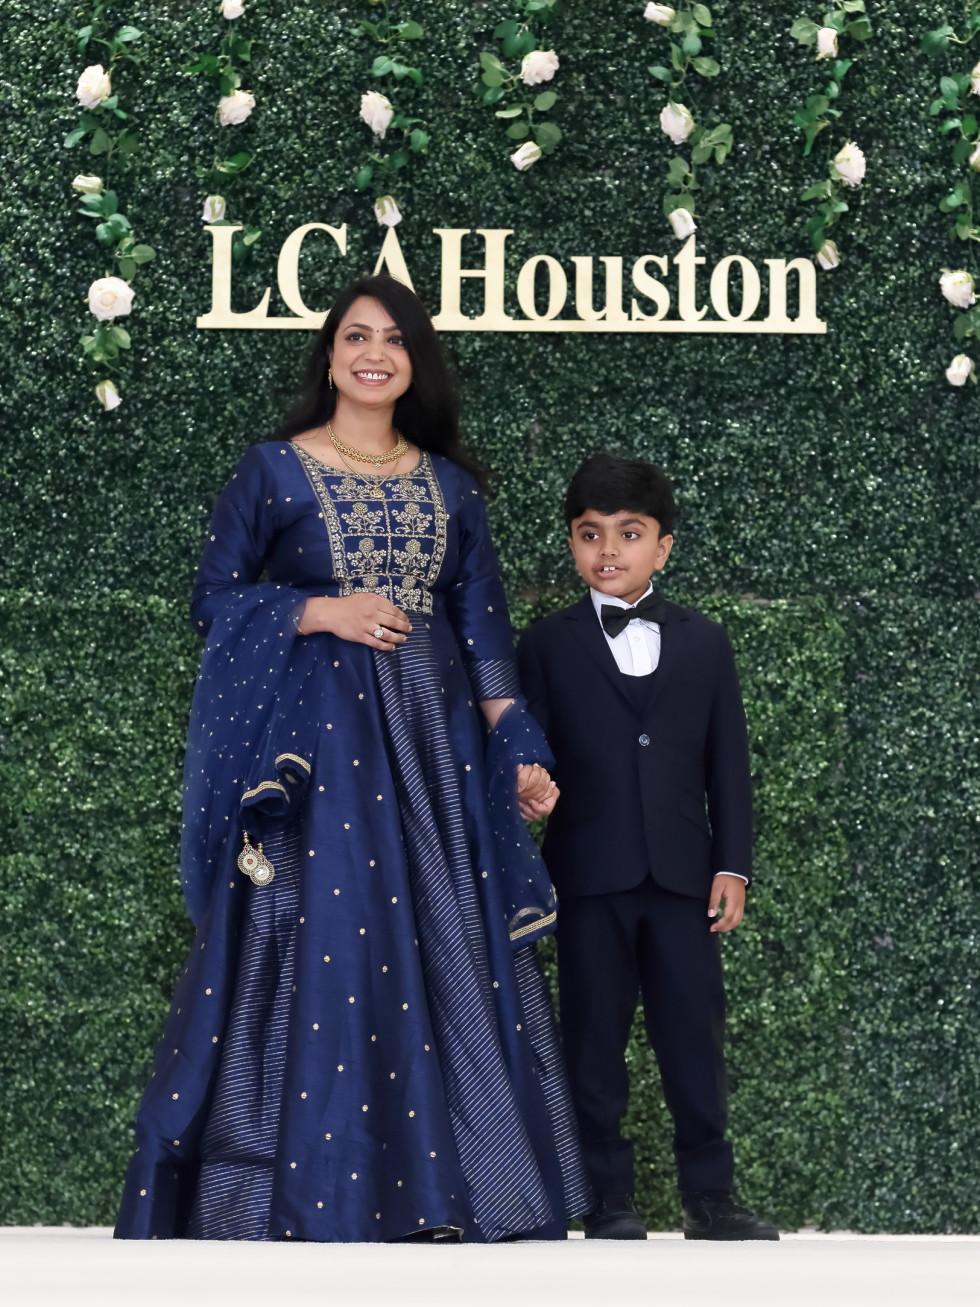 LCA Houston Mother's Day Soiree 2021Deepika Agarwal with her son Aryan